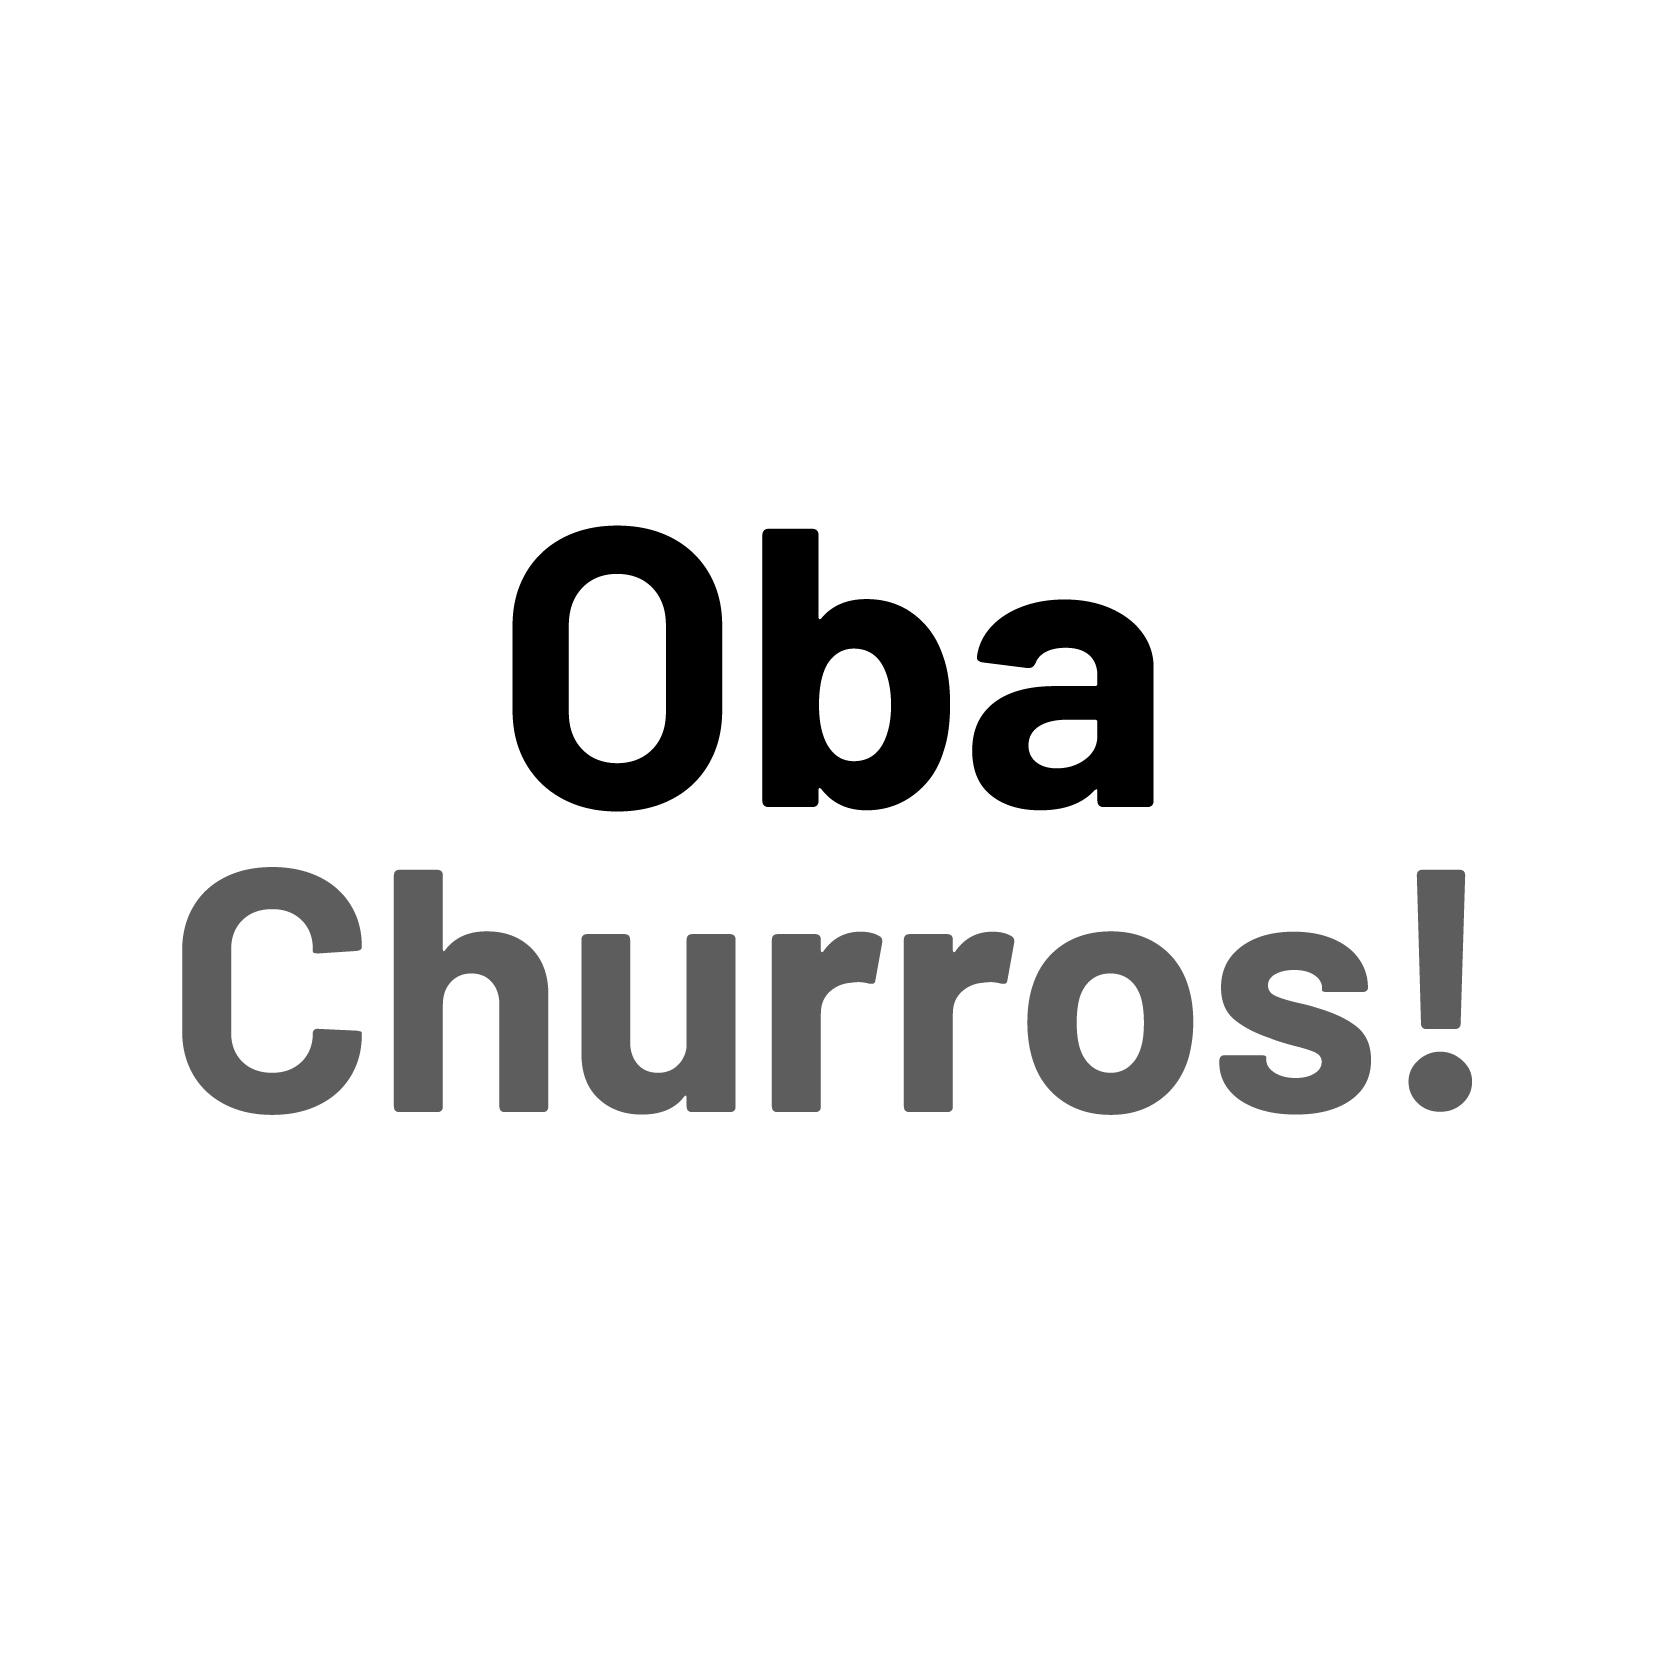 Oba Churros